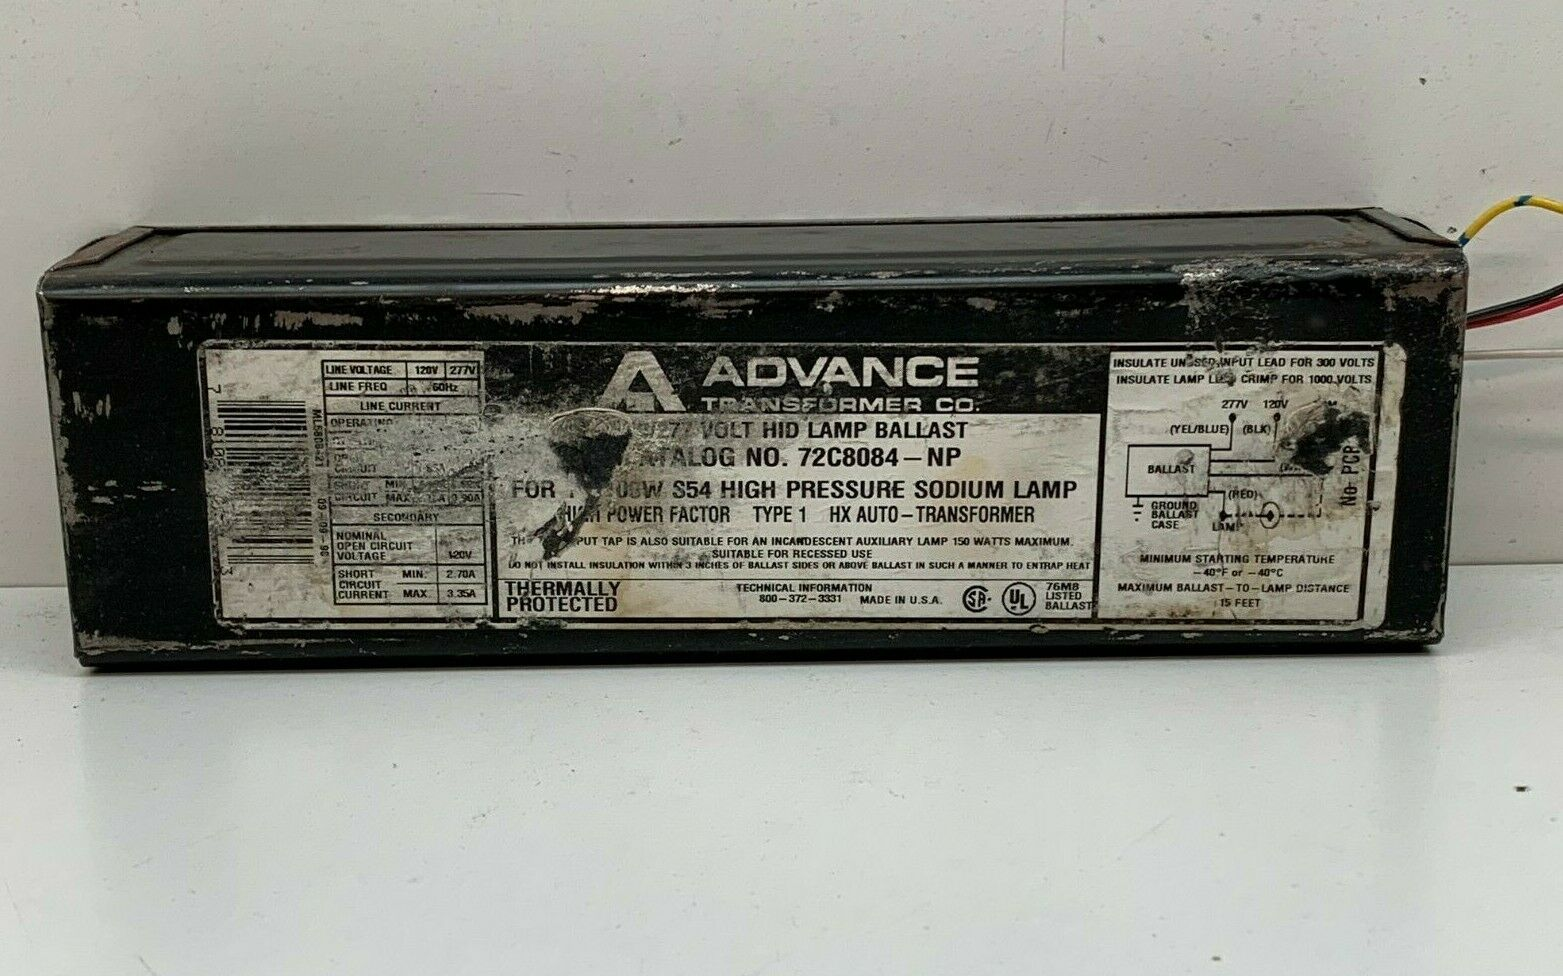 New Philips Advance  72C8084-NP Lamp Ballast New Open Box